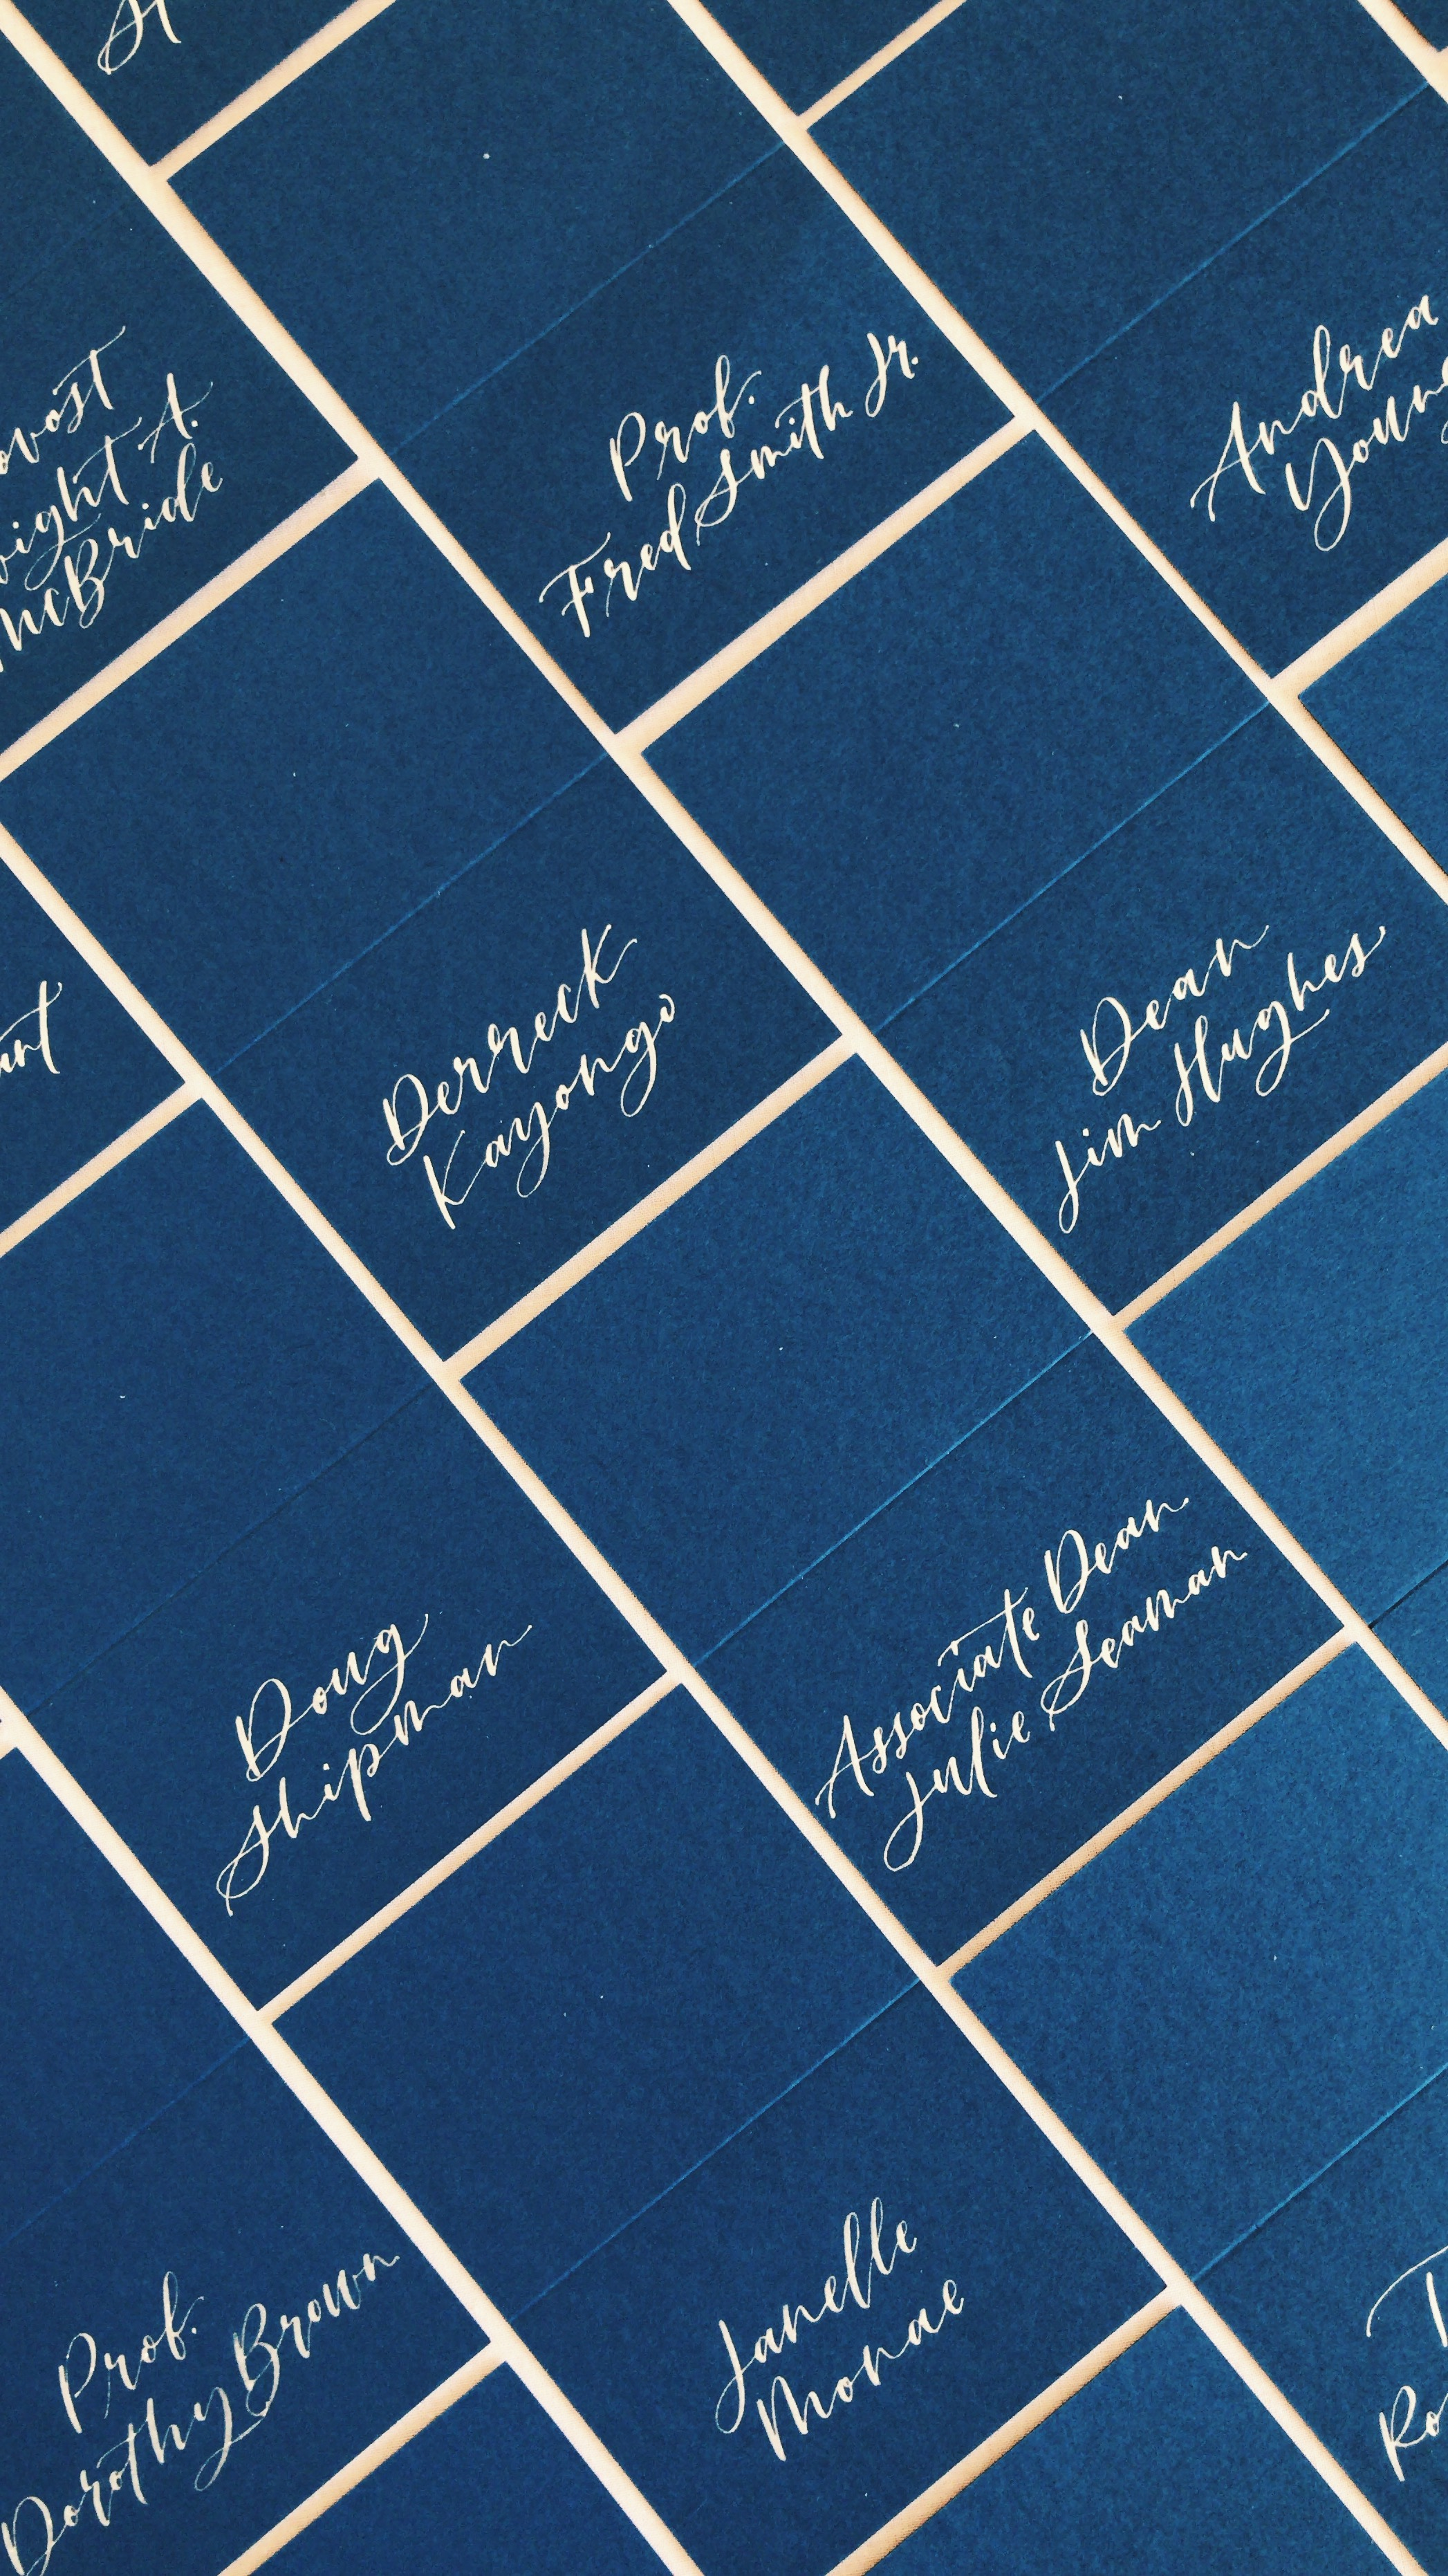 heylux_carriebelleevents_placecards_sotomayor_dinner_atlanta.JPG